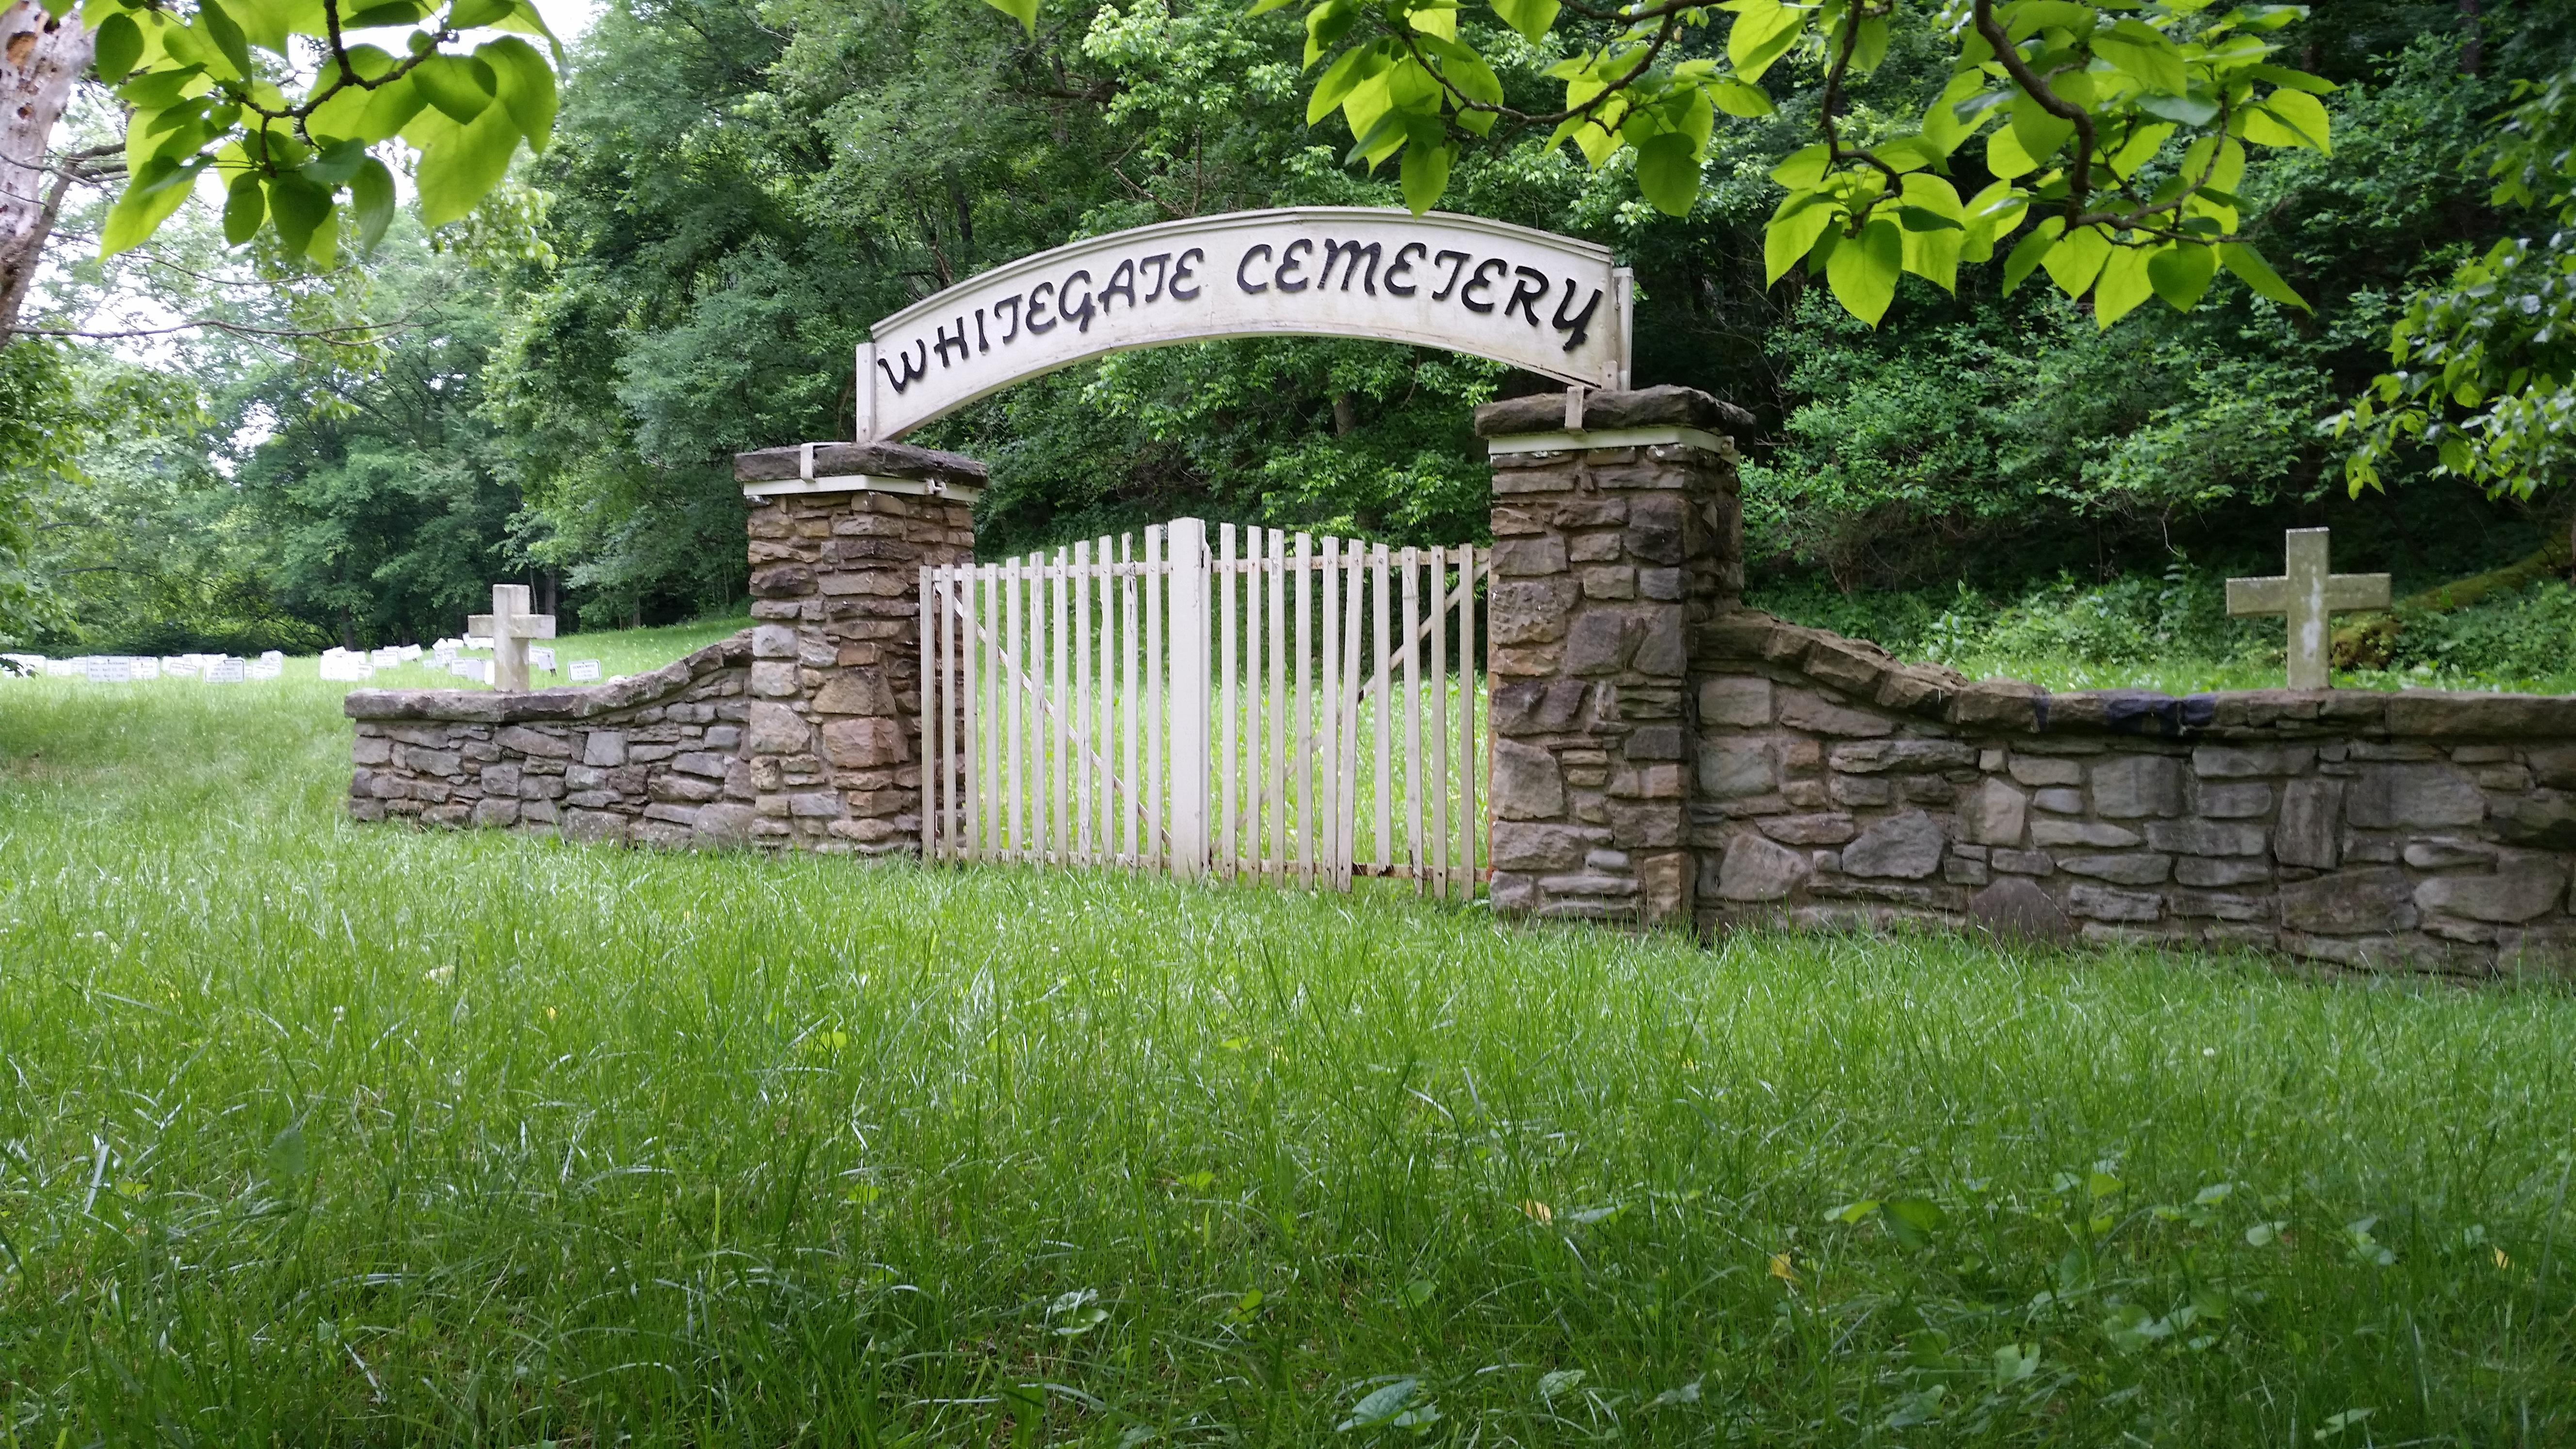 Whitegate Cemetery